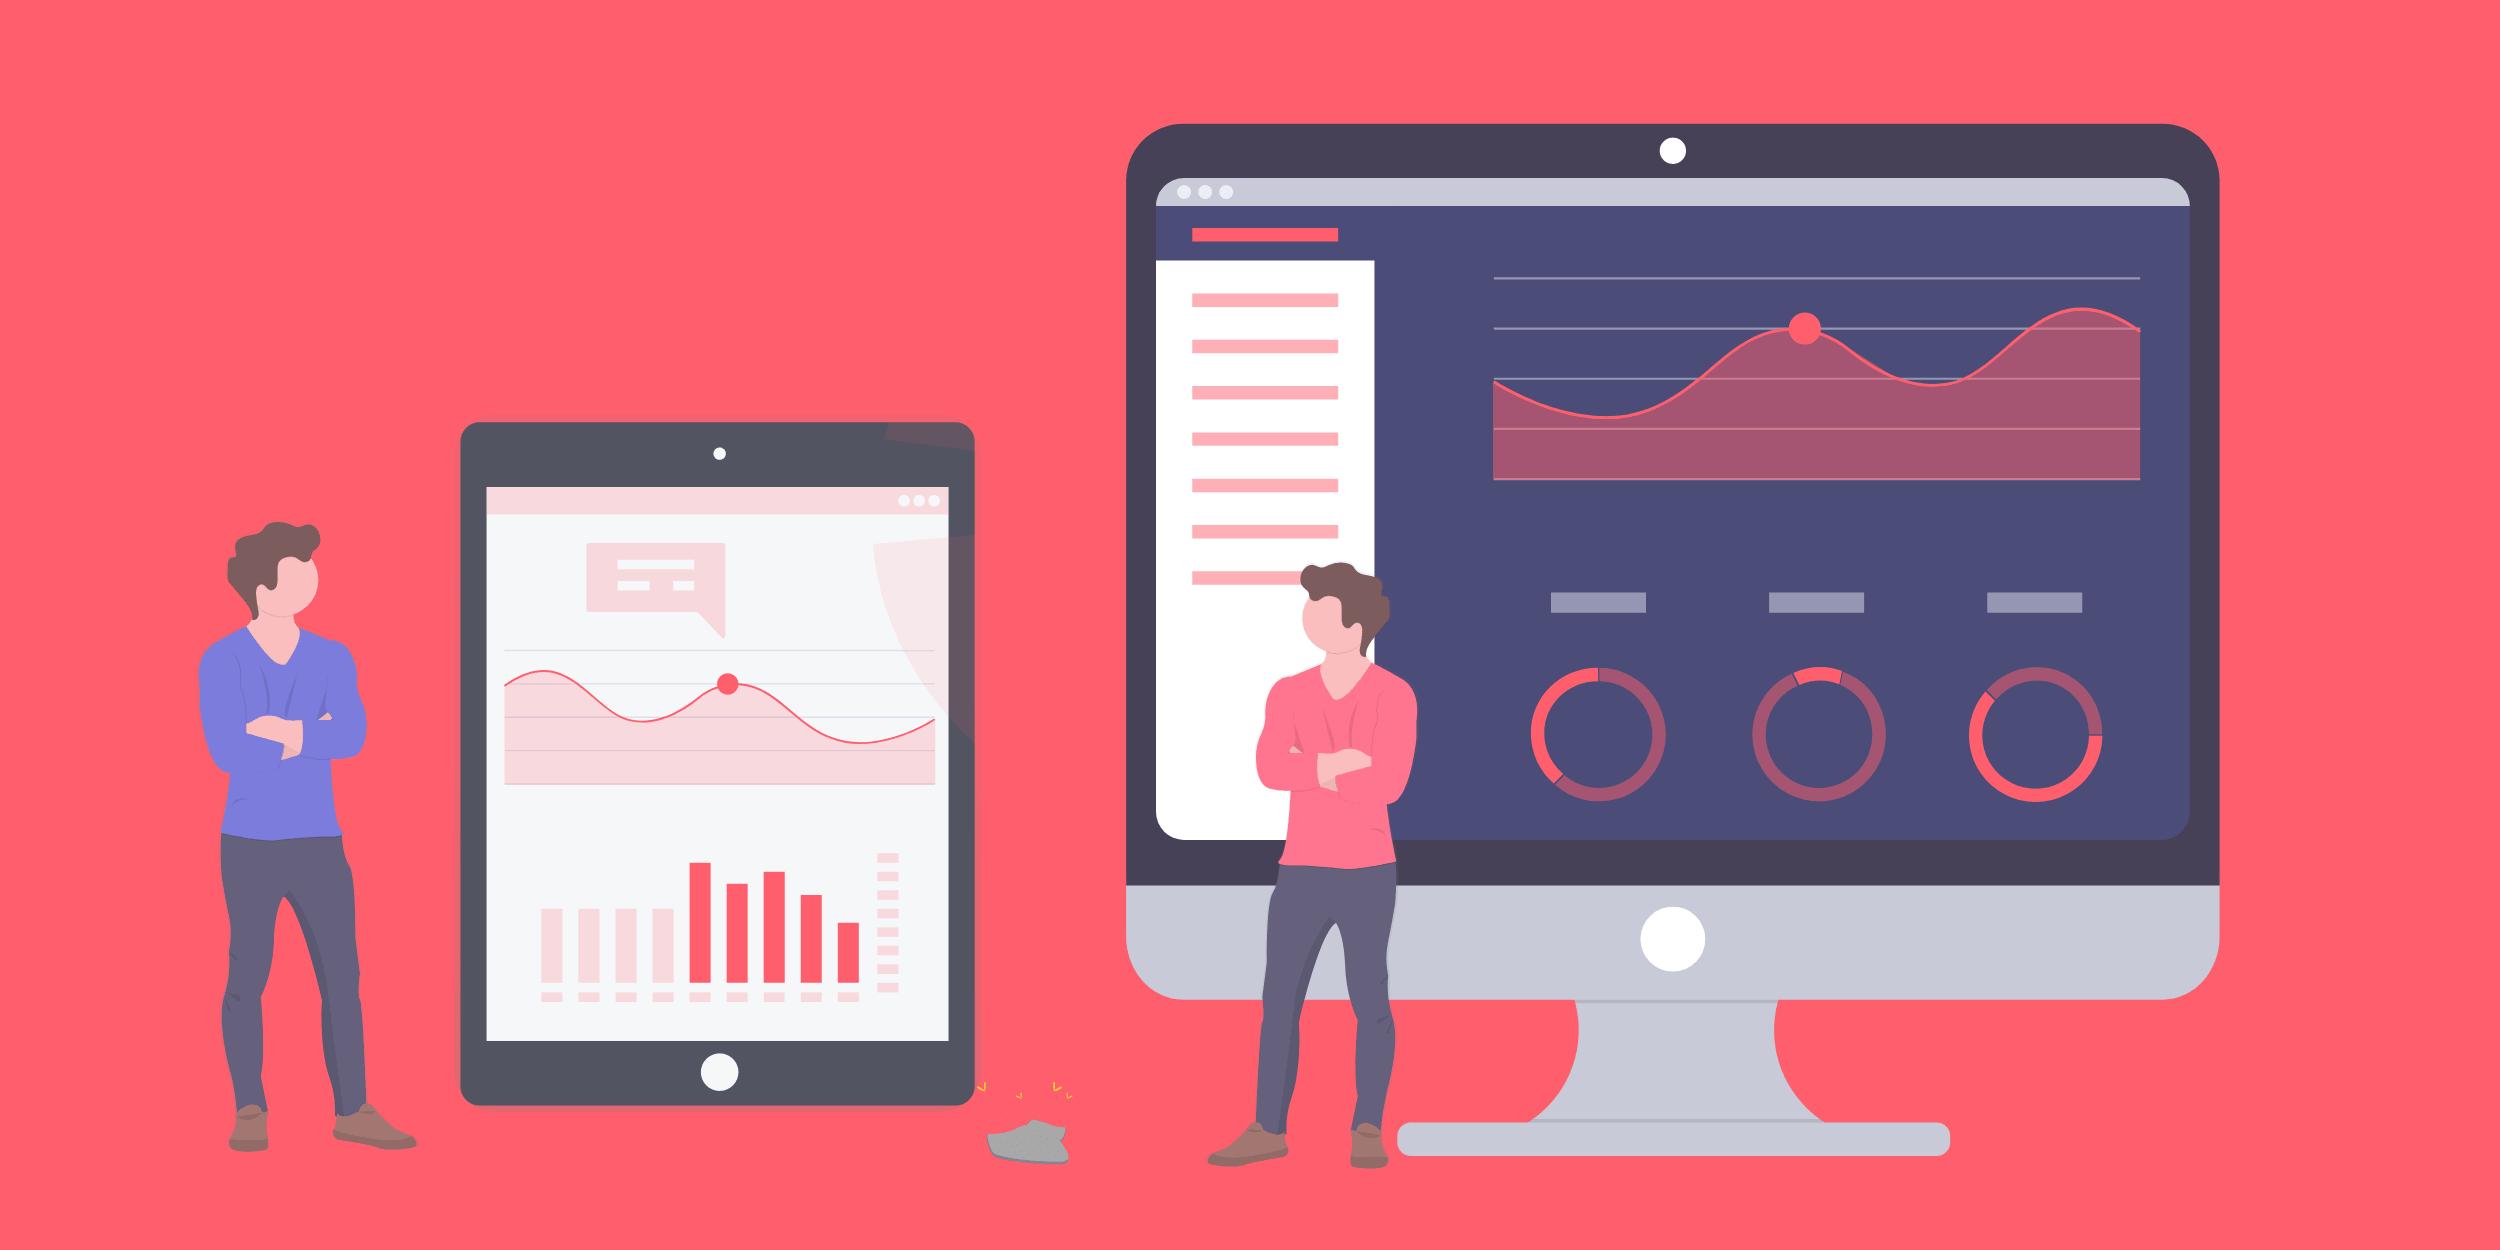 7_raisons_utiliser_data_storytelling_data_visualation